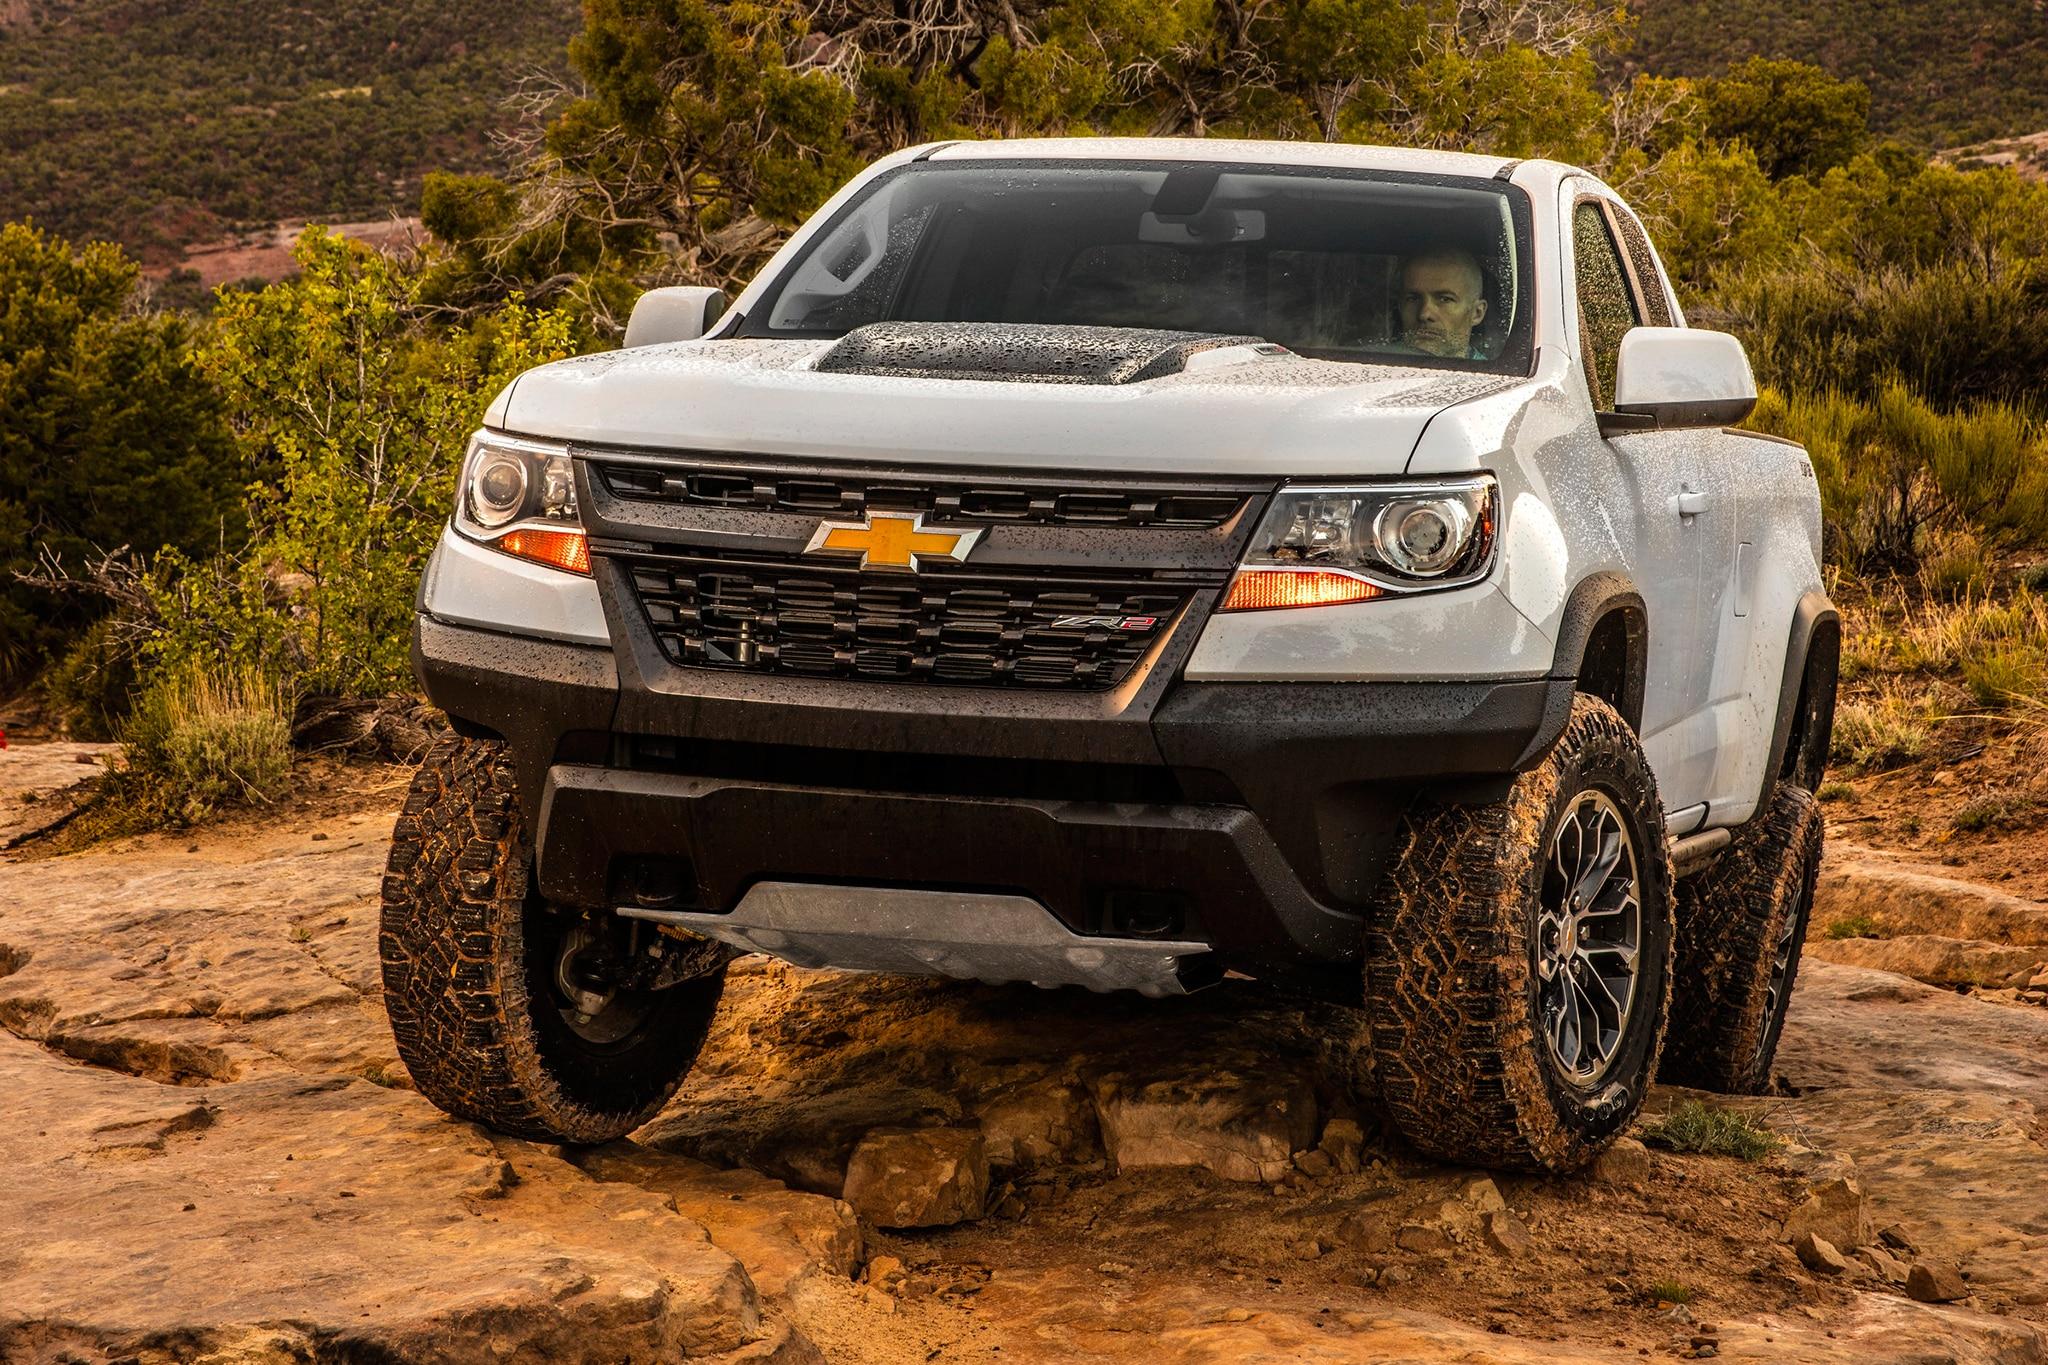 2019 Chevrolet Colorado ZR2 Review: Capable—and Safe, Too